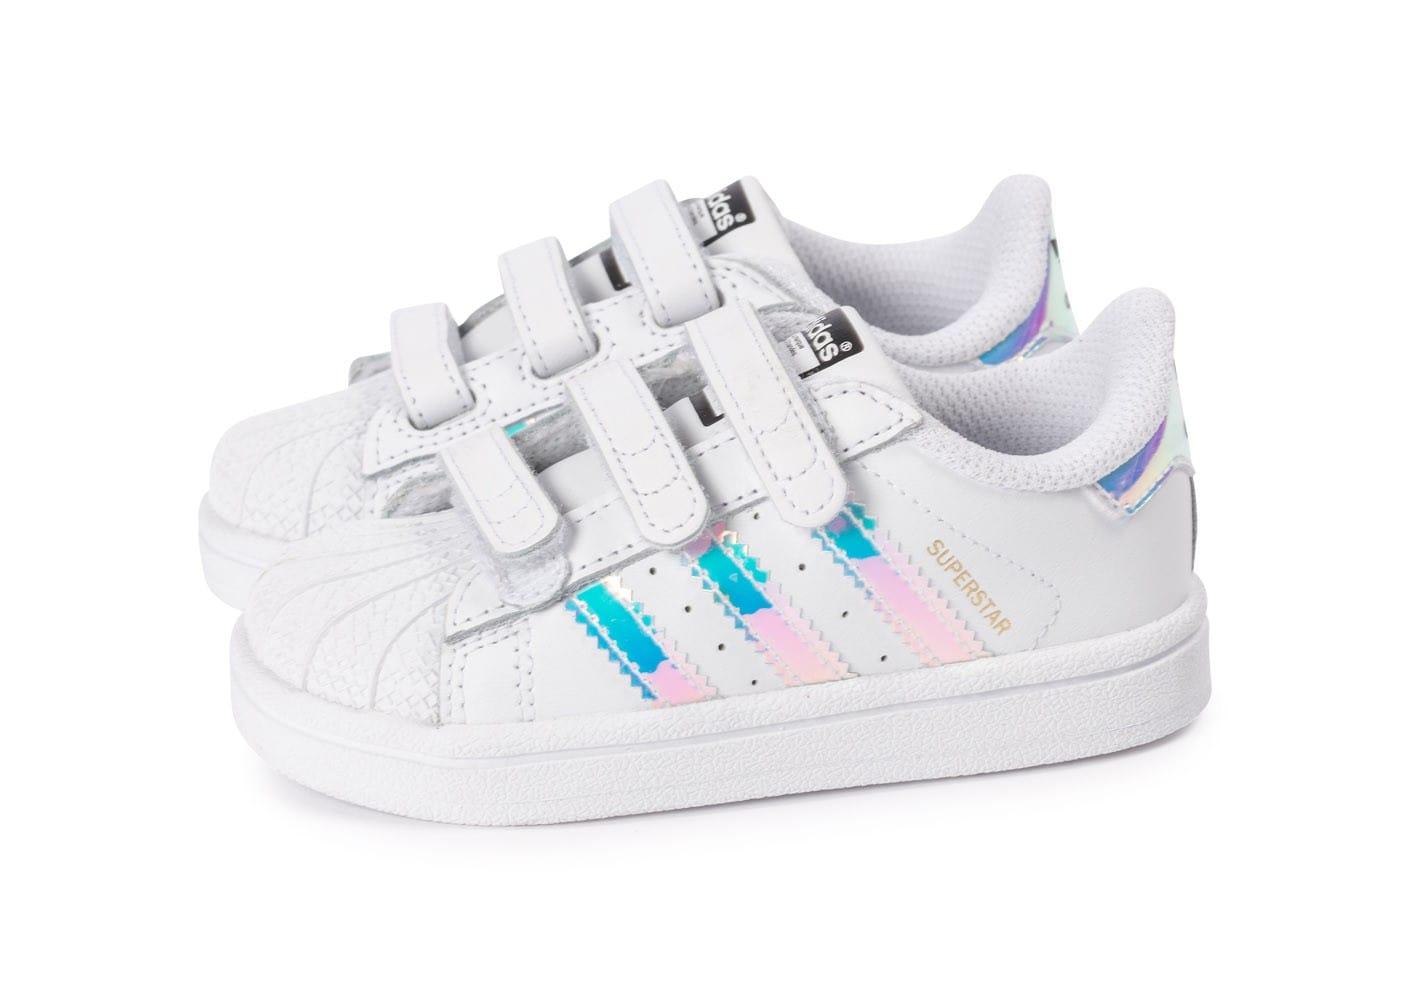 Adidas Pas Cher Chausport Adidas Superstar hdsxtrBQC